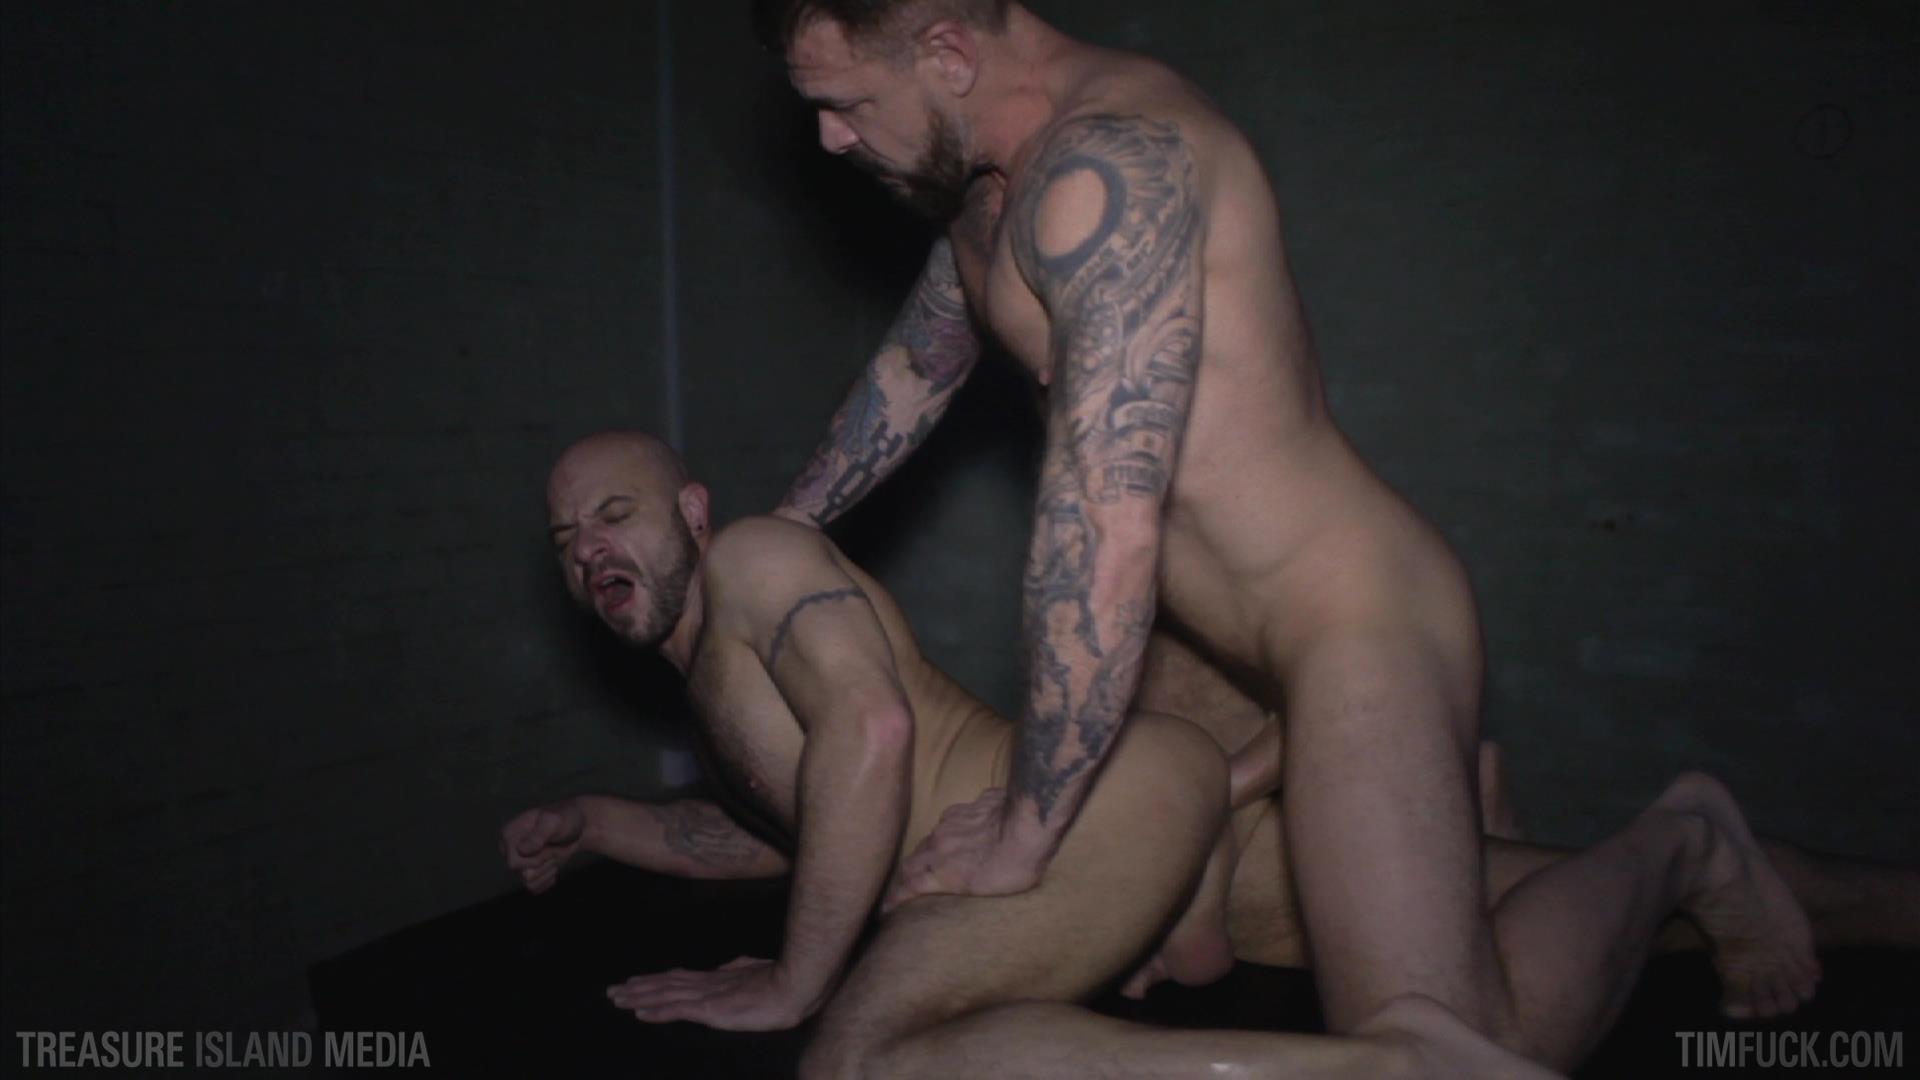 Treasure-Island-Media-TimFuck-Rocco-Steele-and-Ben-Statham-Bareback-Amateur-Gay-Porn-32 Treasure Island Media: Rocco Steele and Ben Statham Bareback In A London Bathhouse